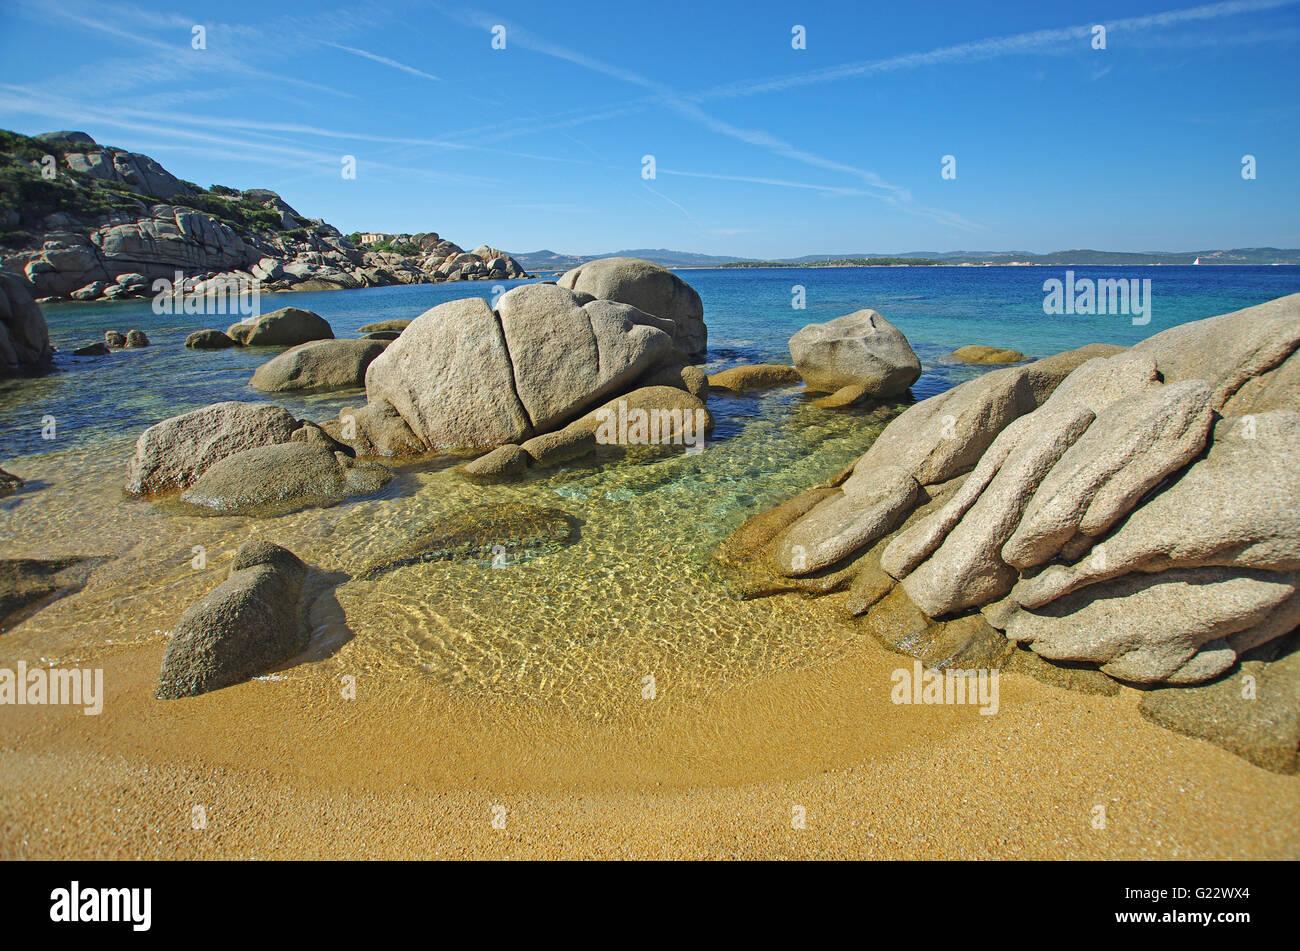 Palau, SARDAIGNE: Talmone beach Photo Stock